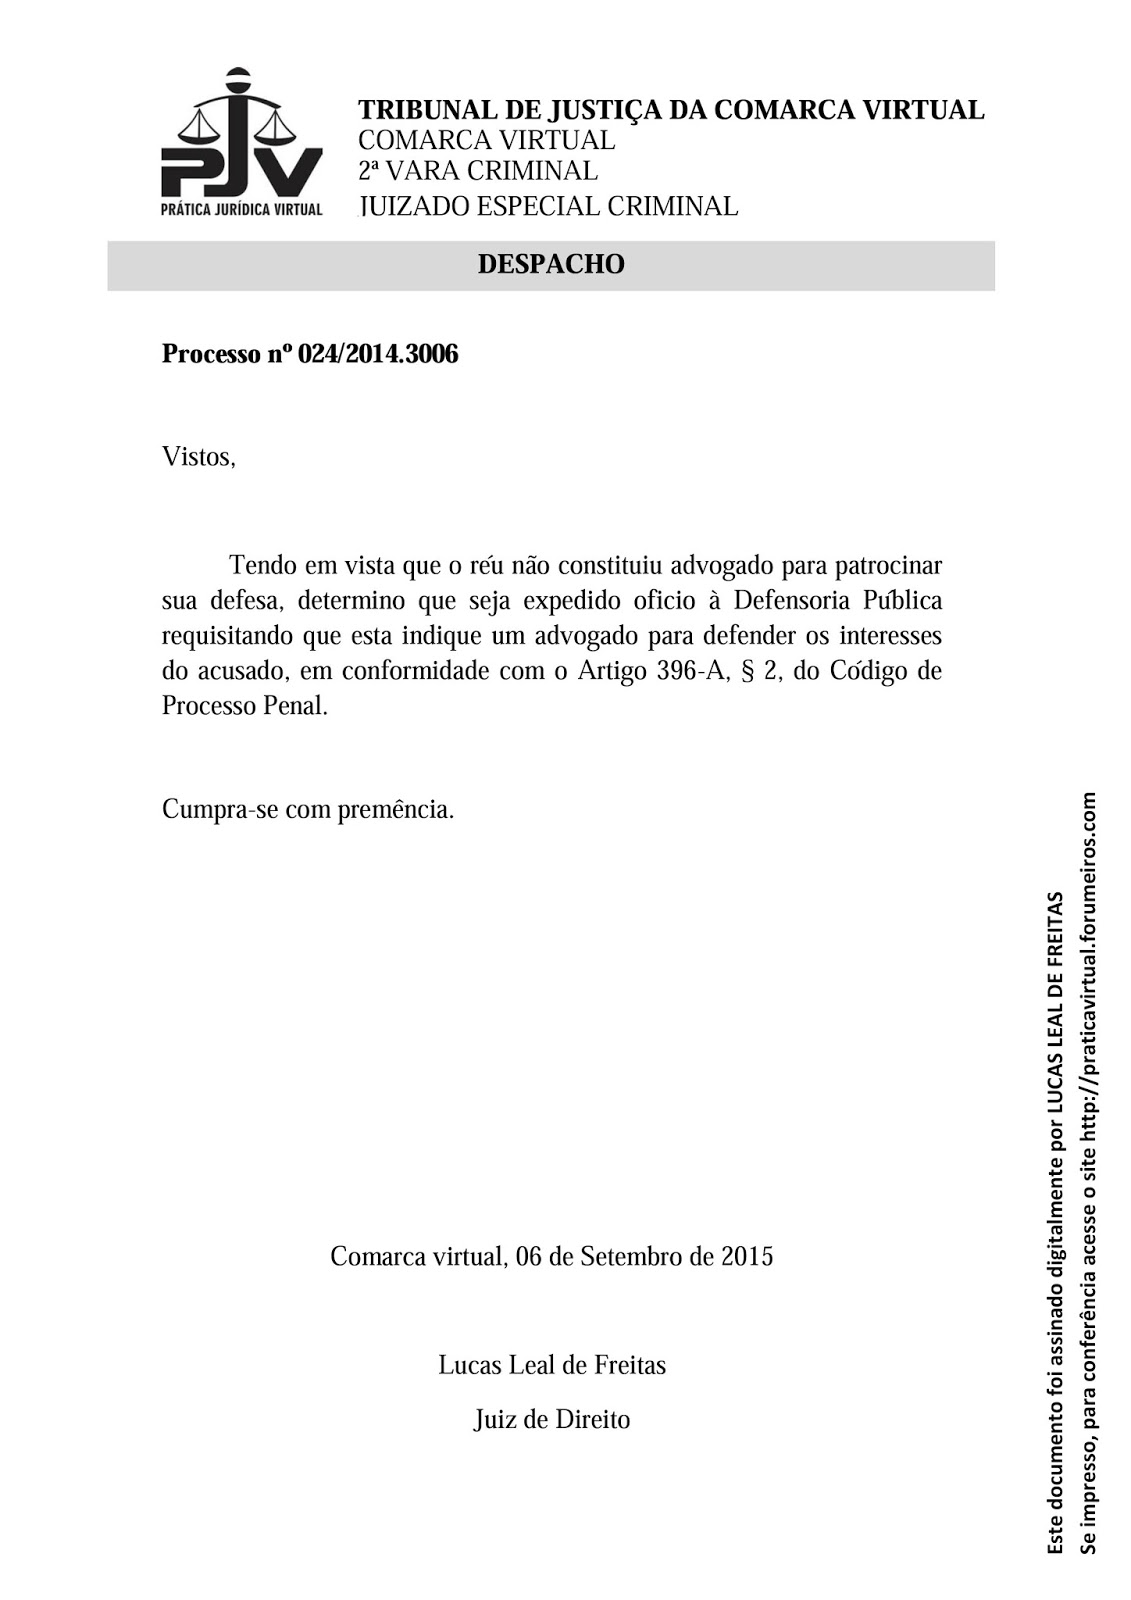 Processo nº 024/2014.3006 Image-0001